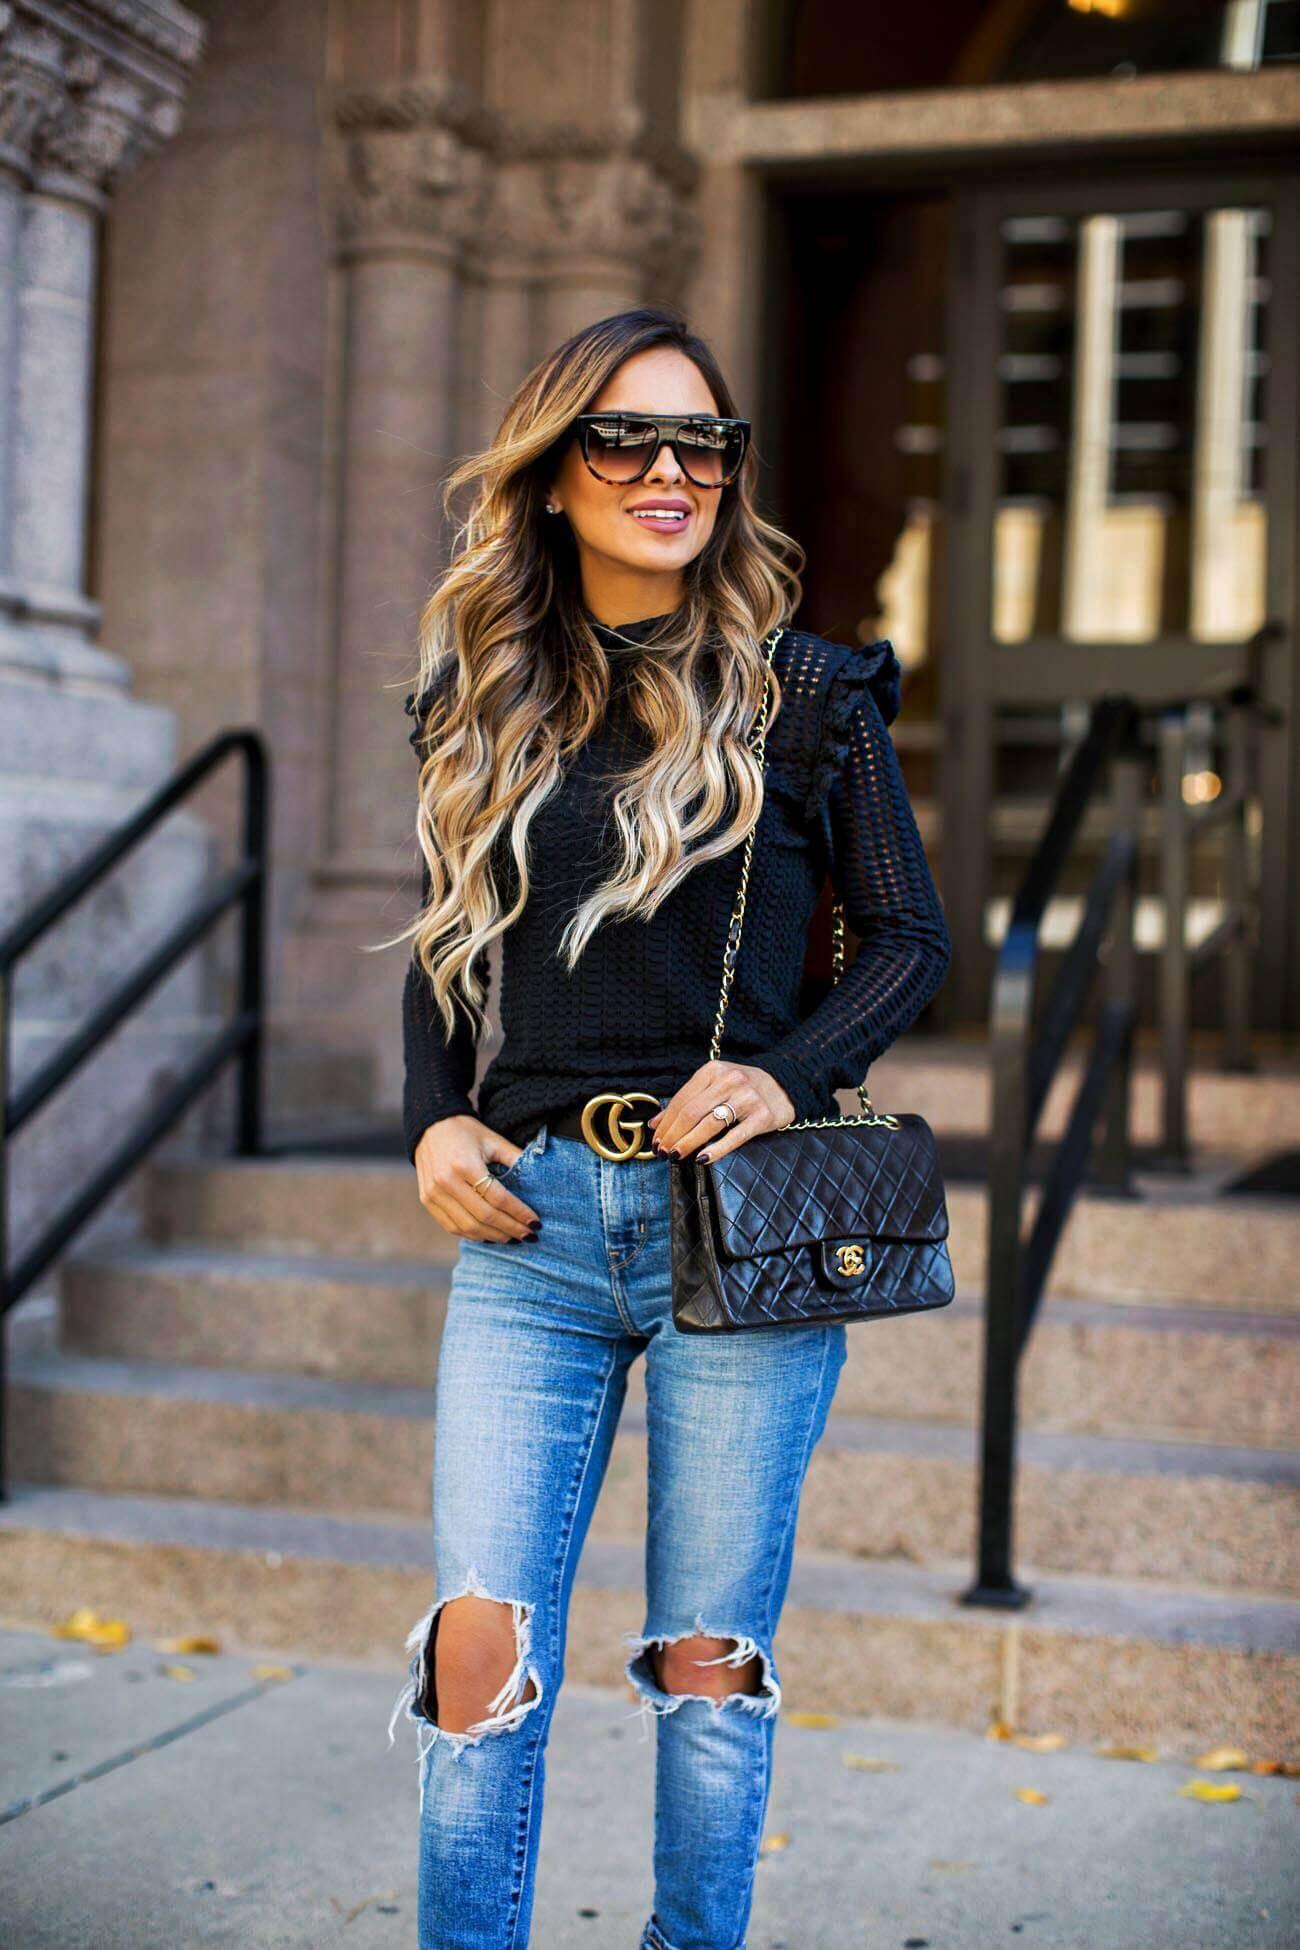 fashion blogger mia mia mine wearing a black turtleneck sweater from  nordstrom wearing a black turtleneck from nordstrom and a gucci double g  buckle belt ab6d8ea2d